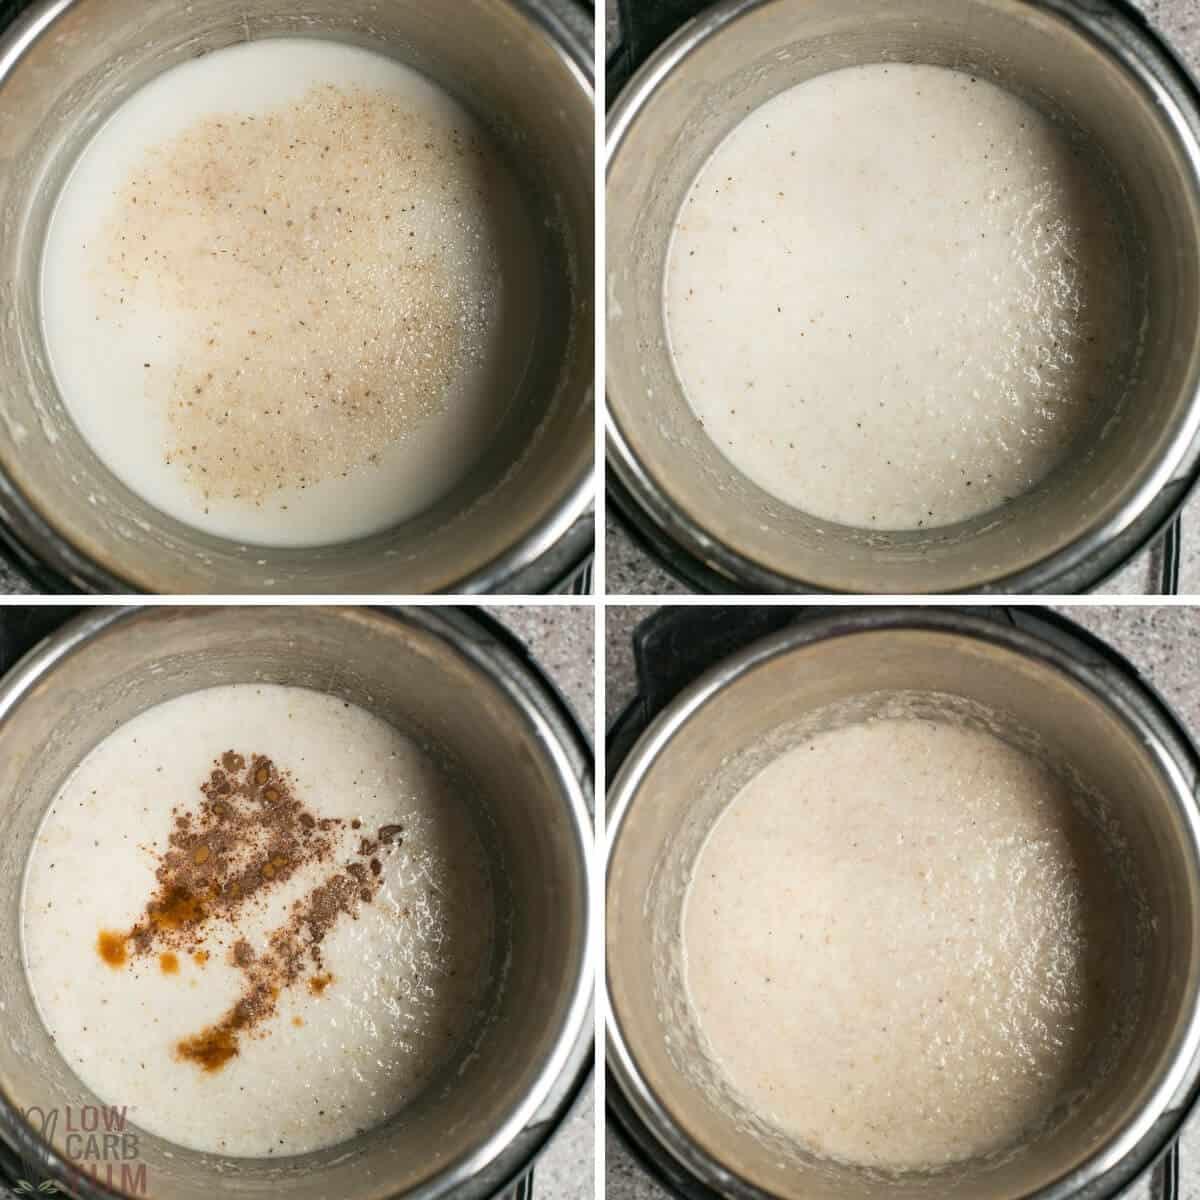 final steps to make porridge in instant pot